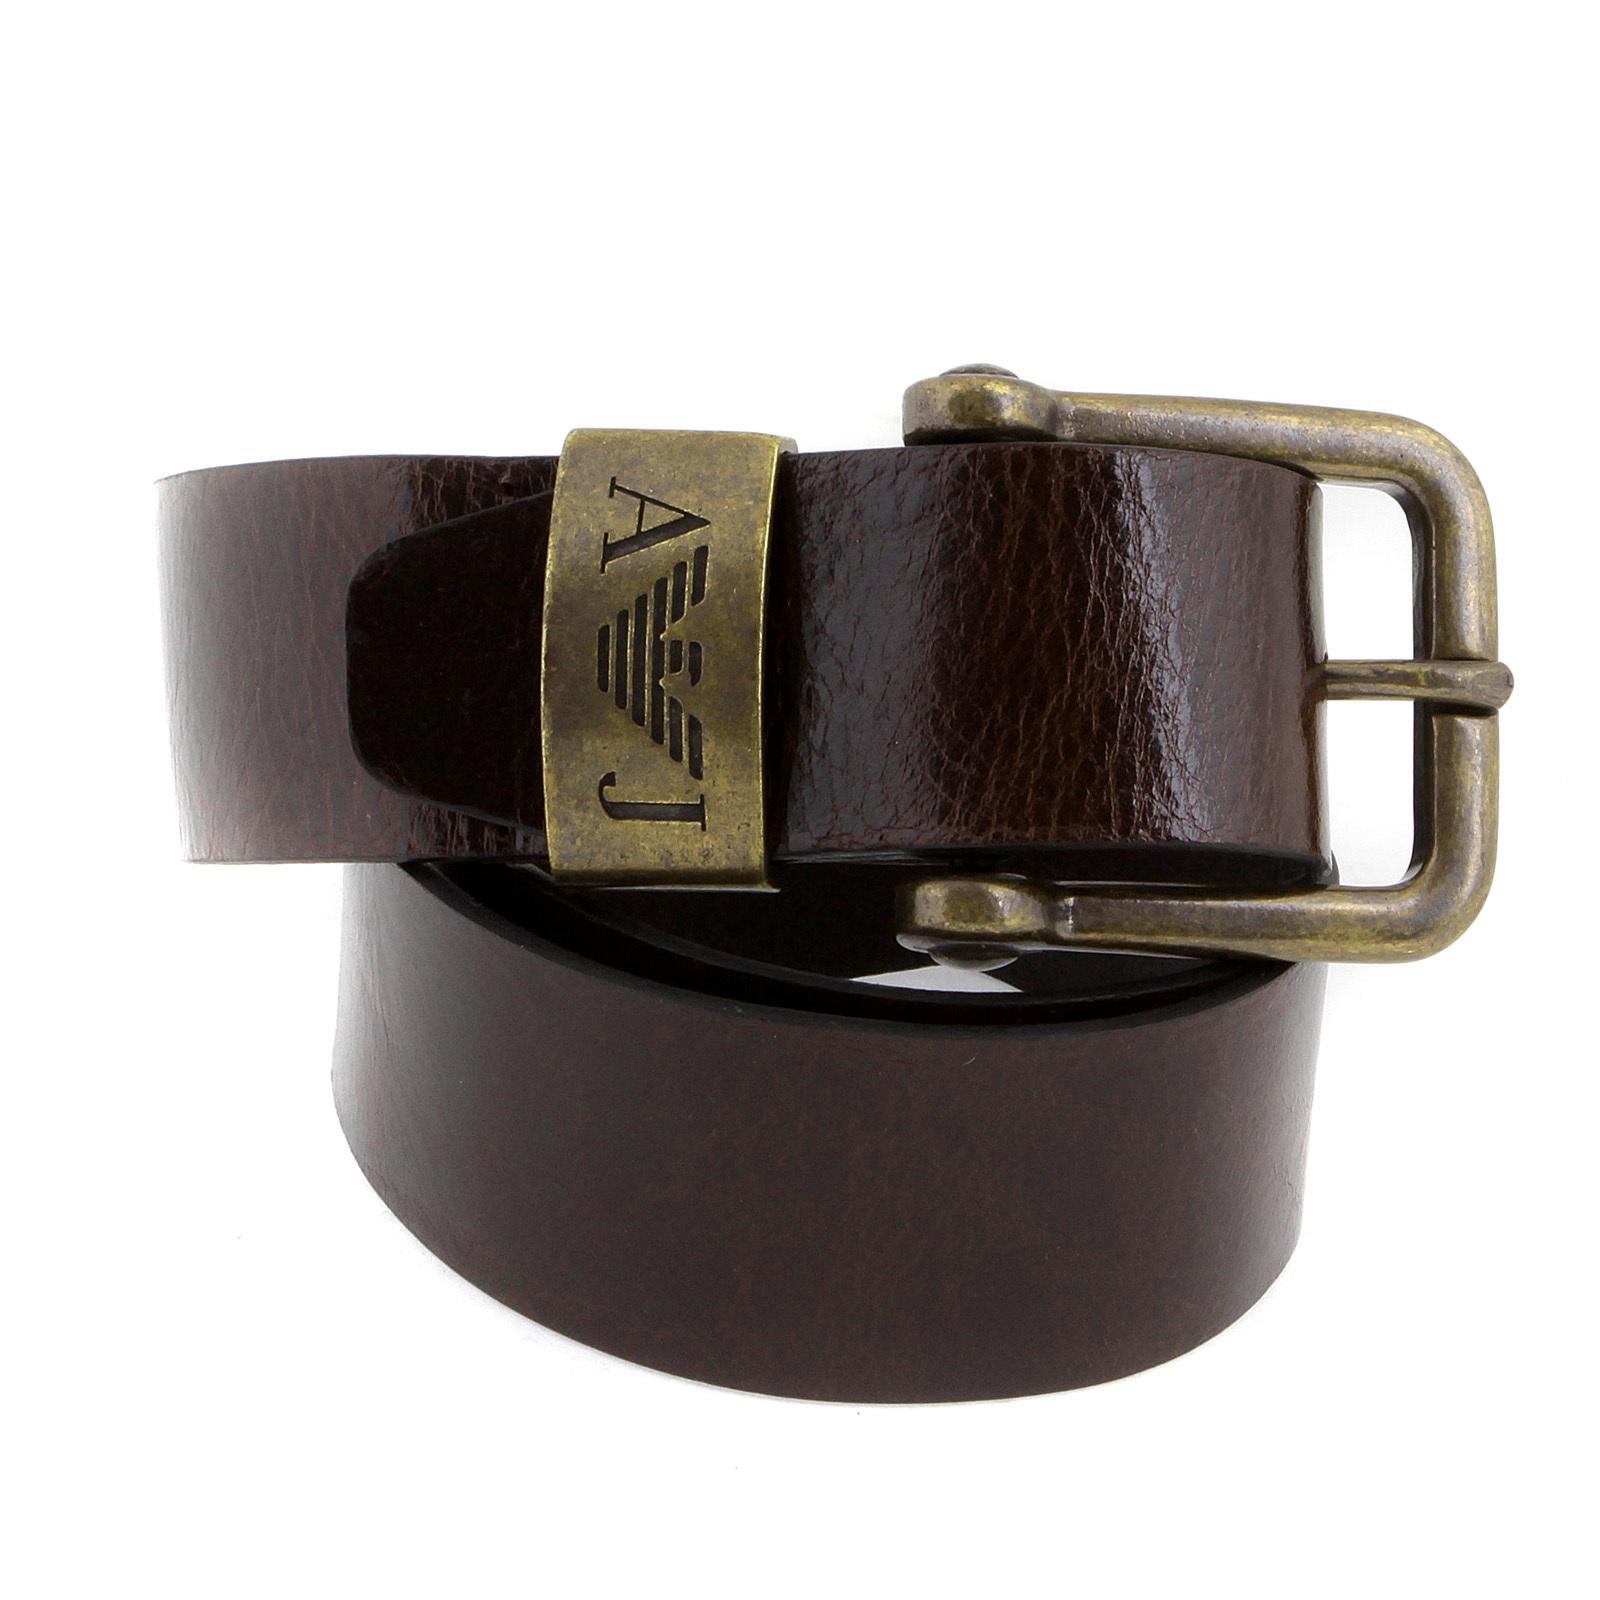 armani chocolate brown leather casual belt p6104 uh